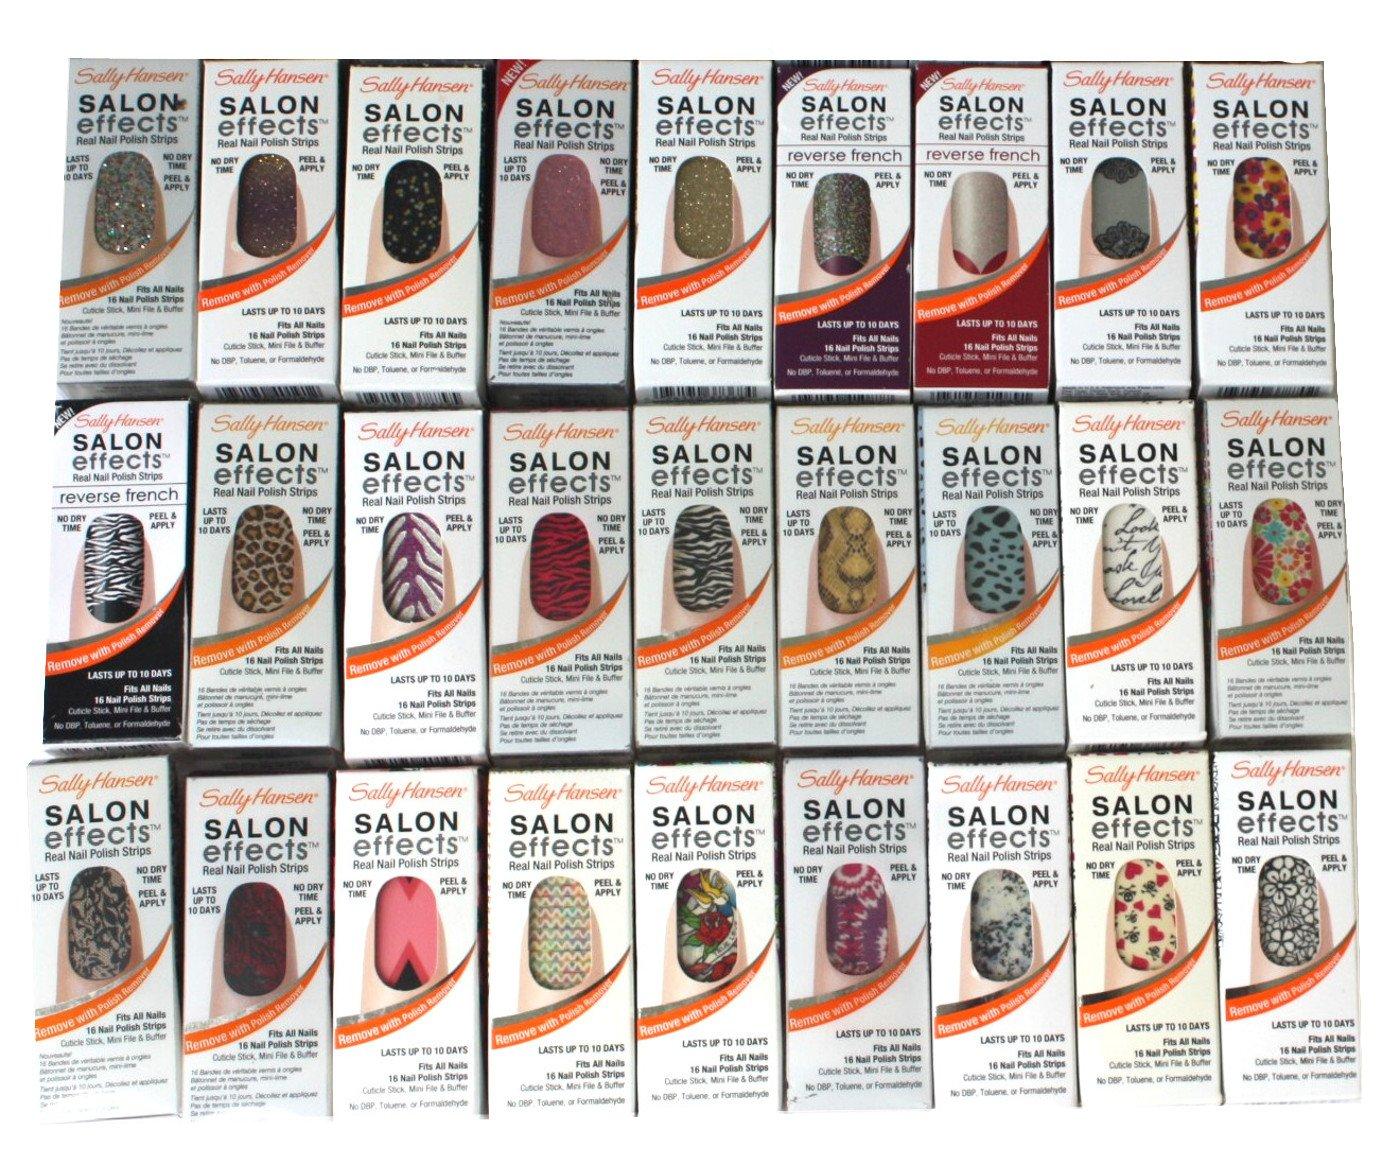 Amazon.com : Lot of 10 Sally Hansen Salon Effect Real Nail Polish ...